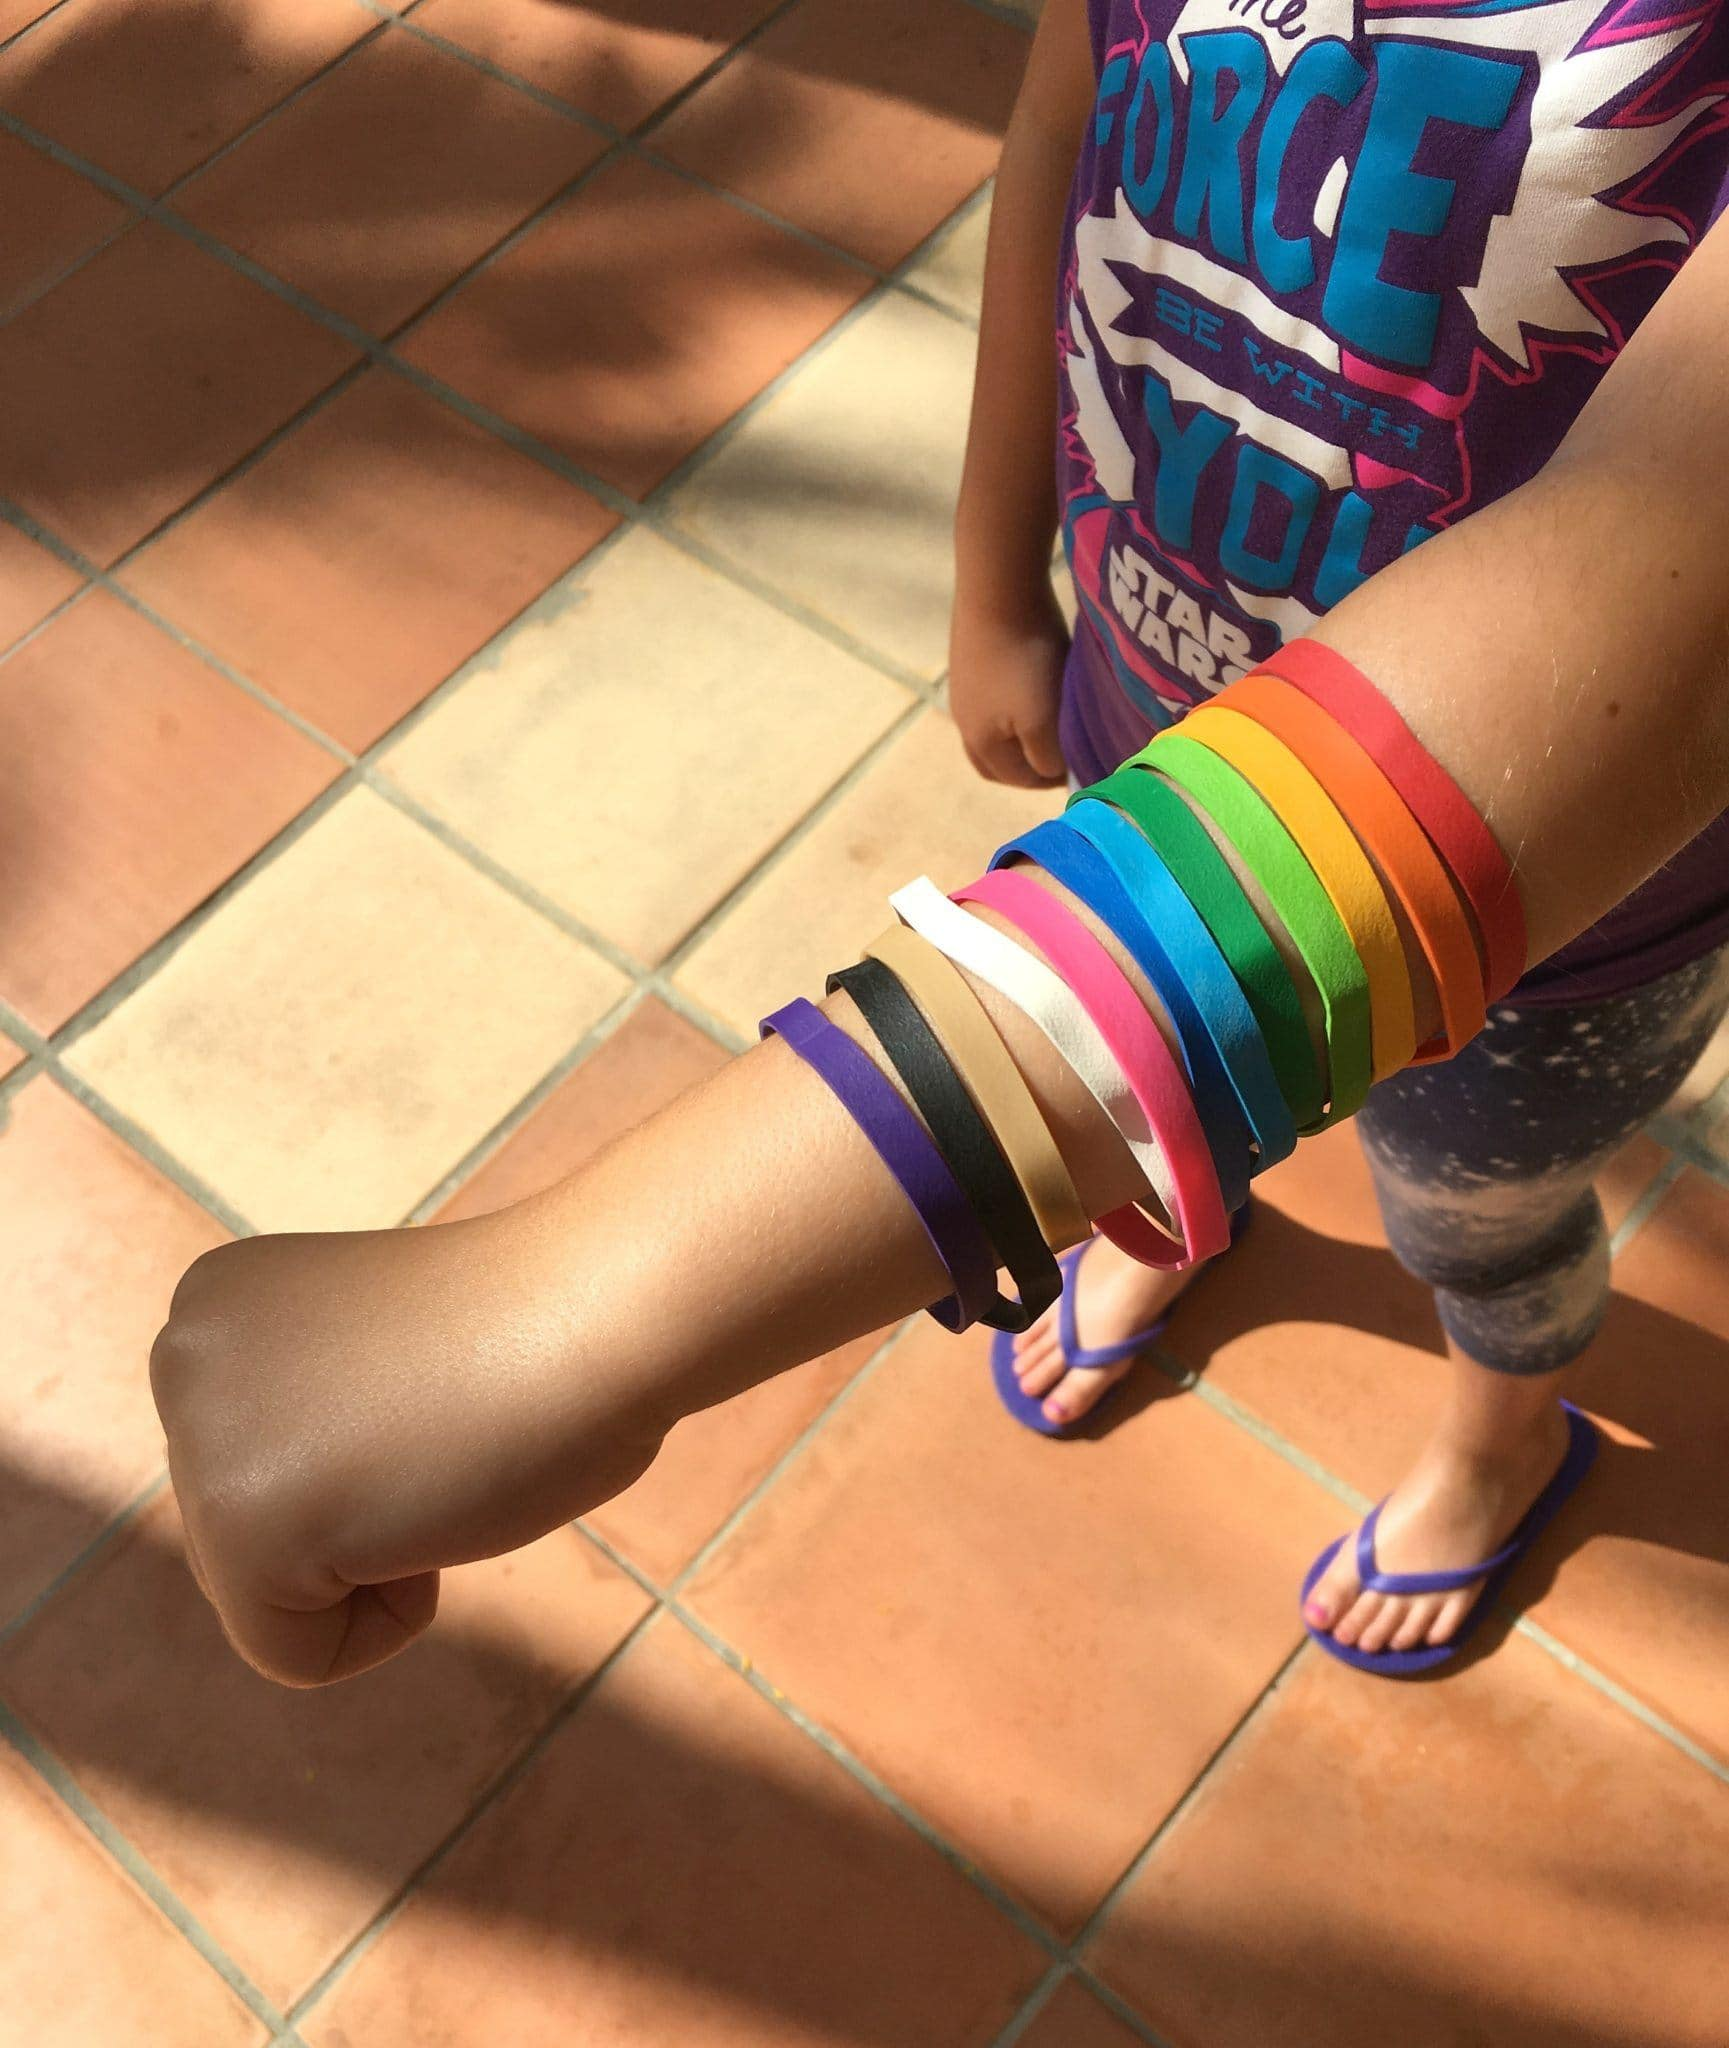 Scout About Program at El Conquistador Resort with Kids